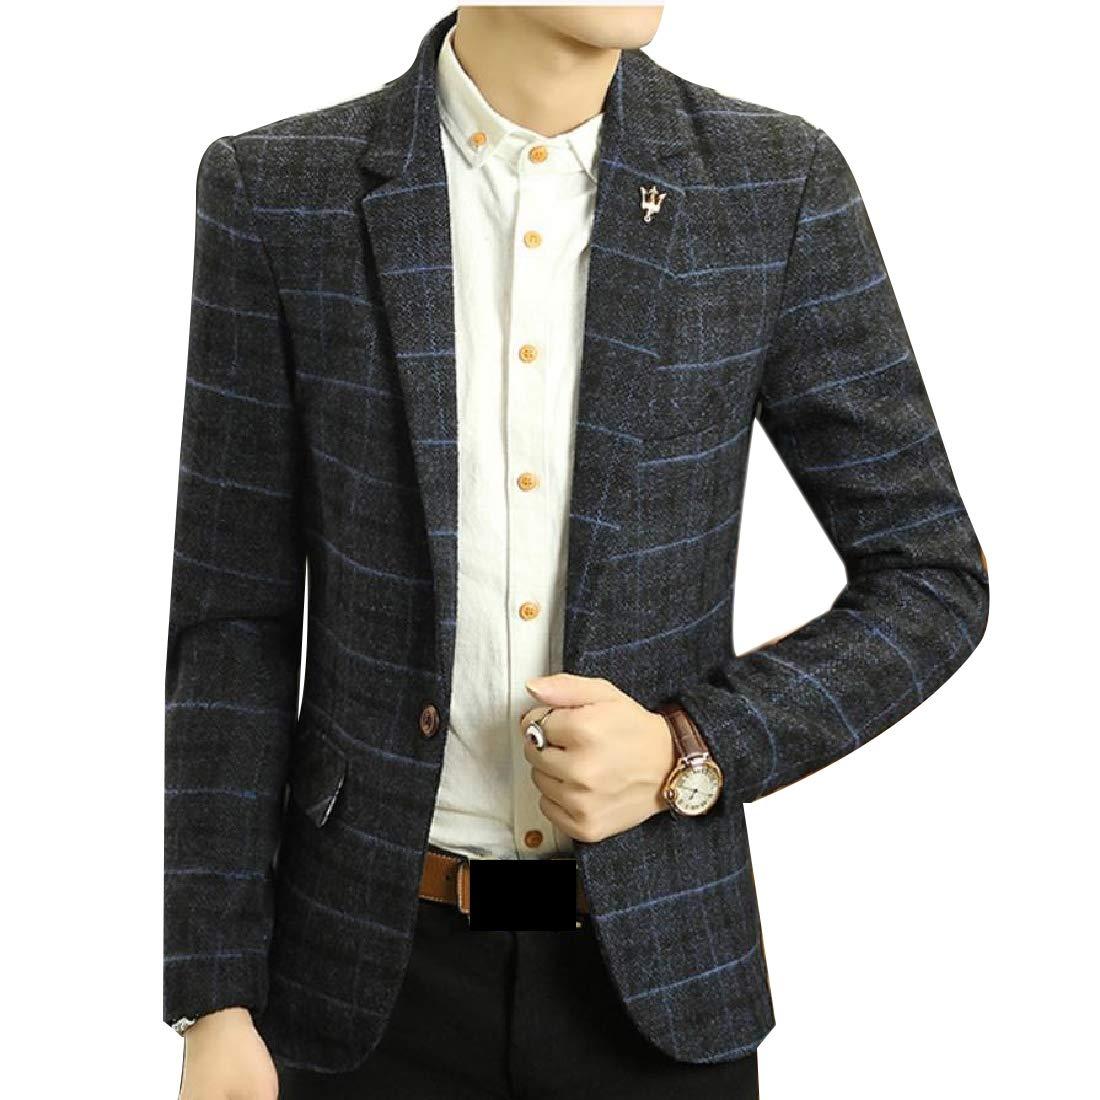 Doufine Men's Plaid Outwear Tops One Button Wool Blend Business Blazer